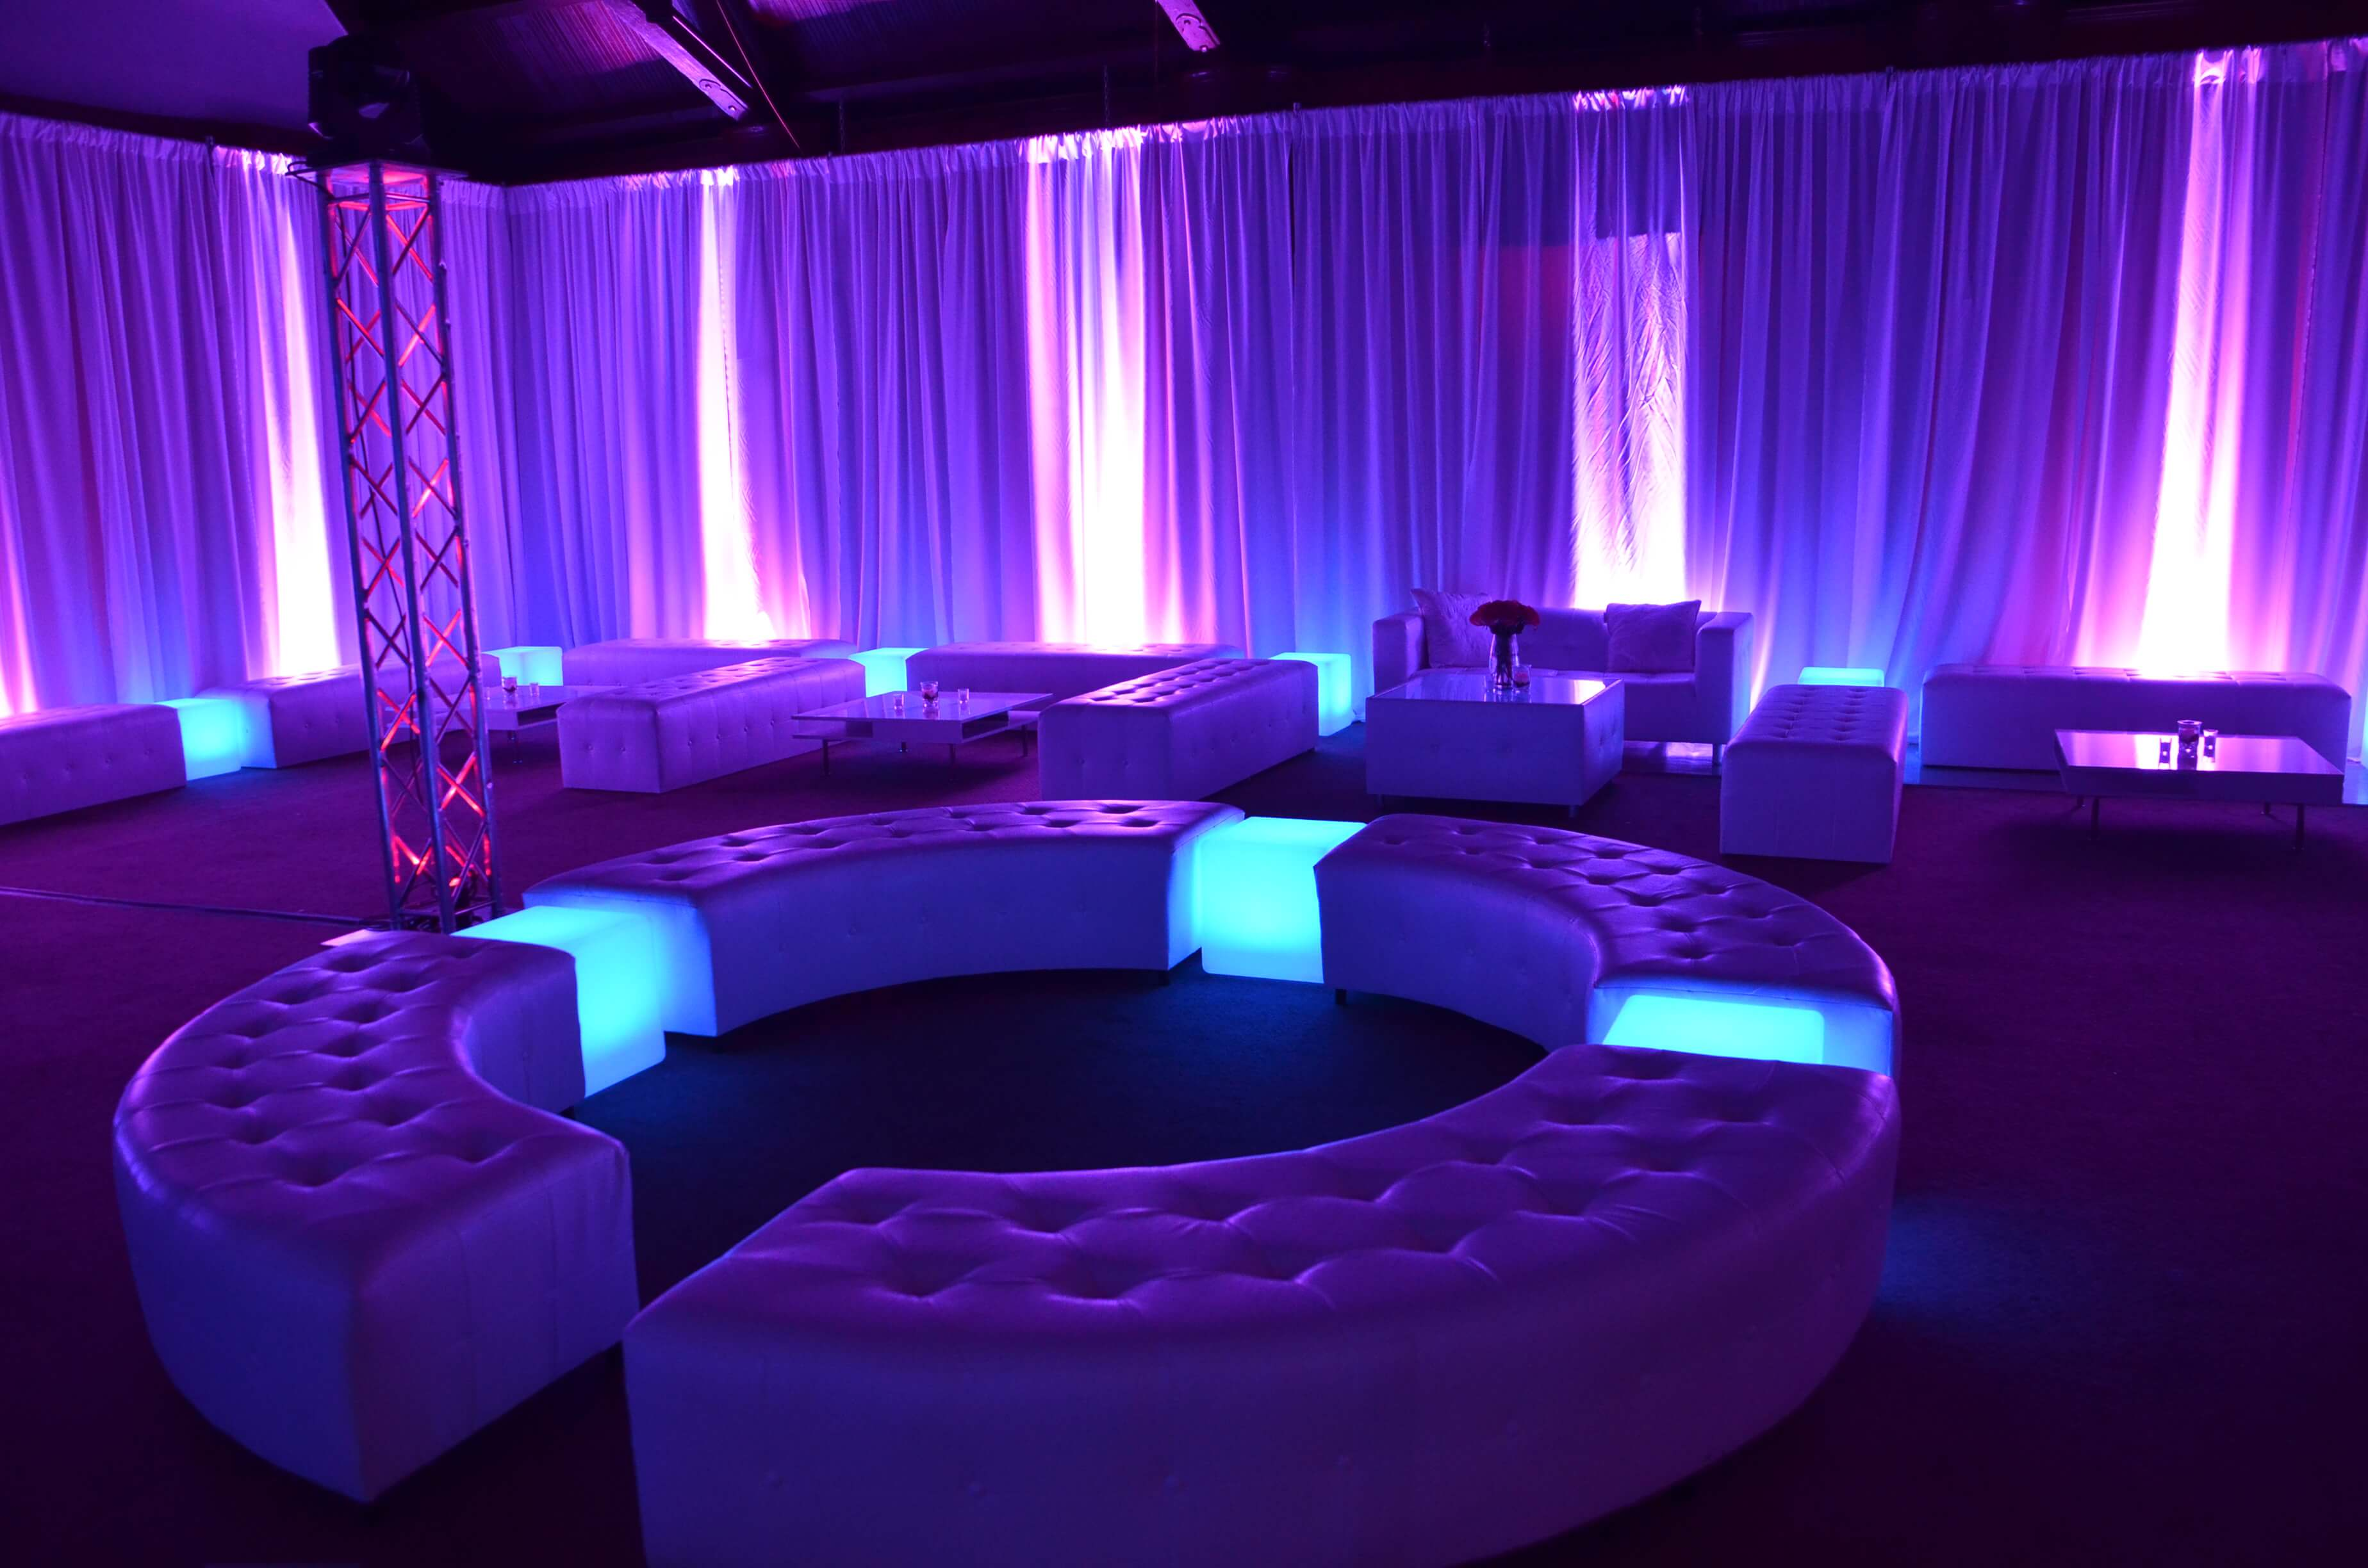 LED Funiture Rentals - Boca Raton, FL